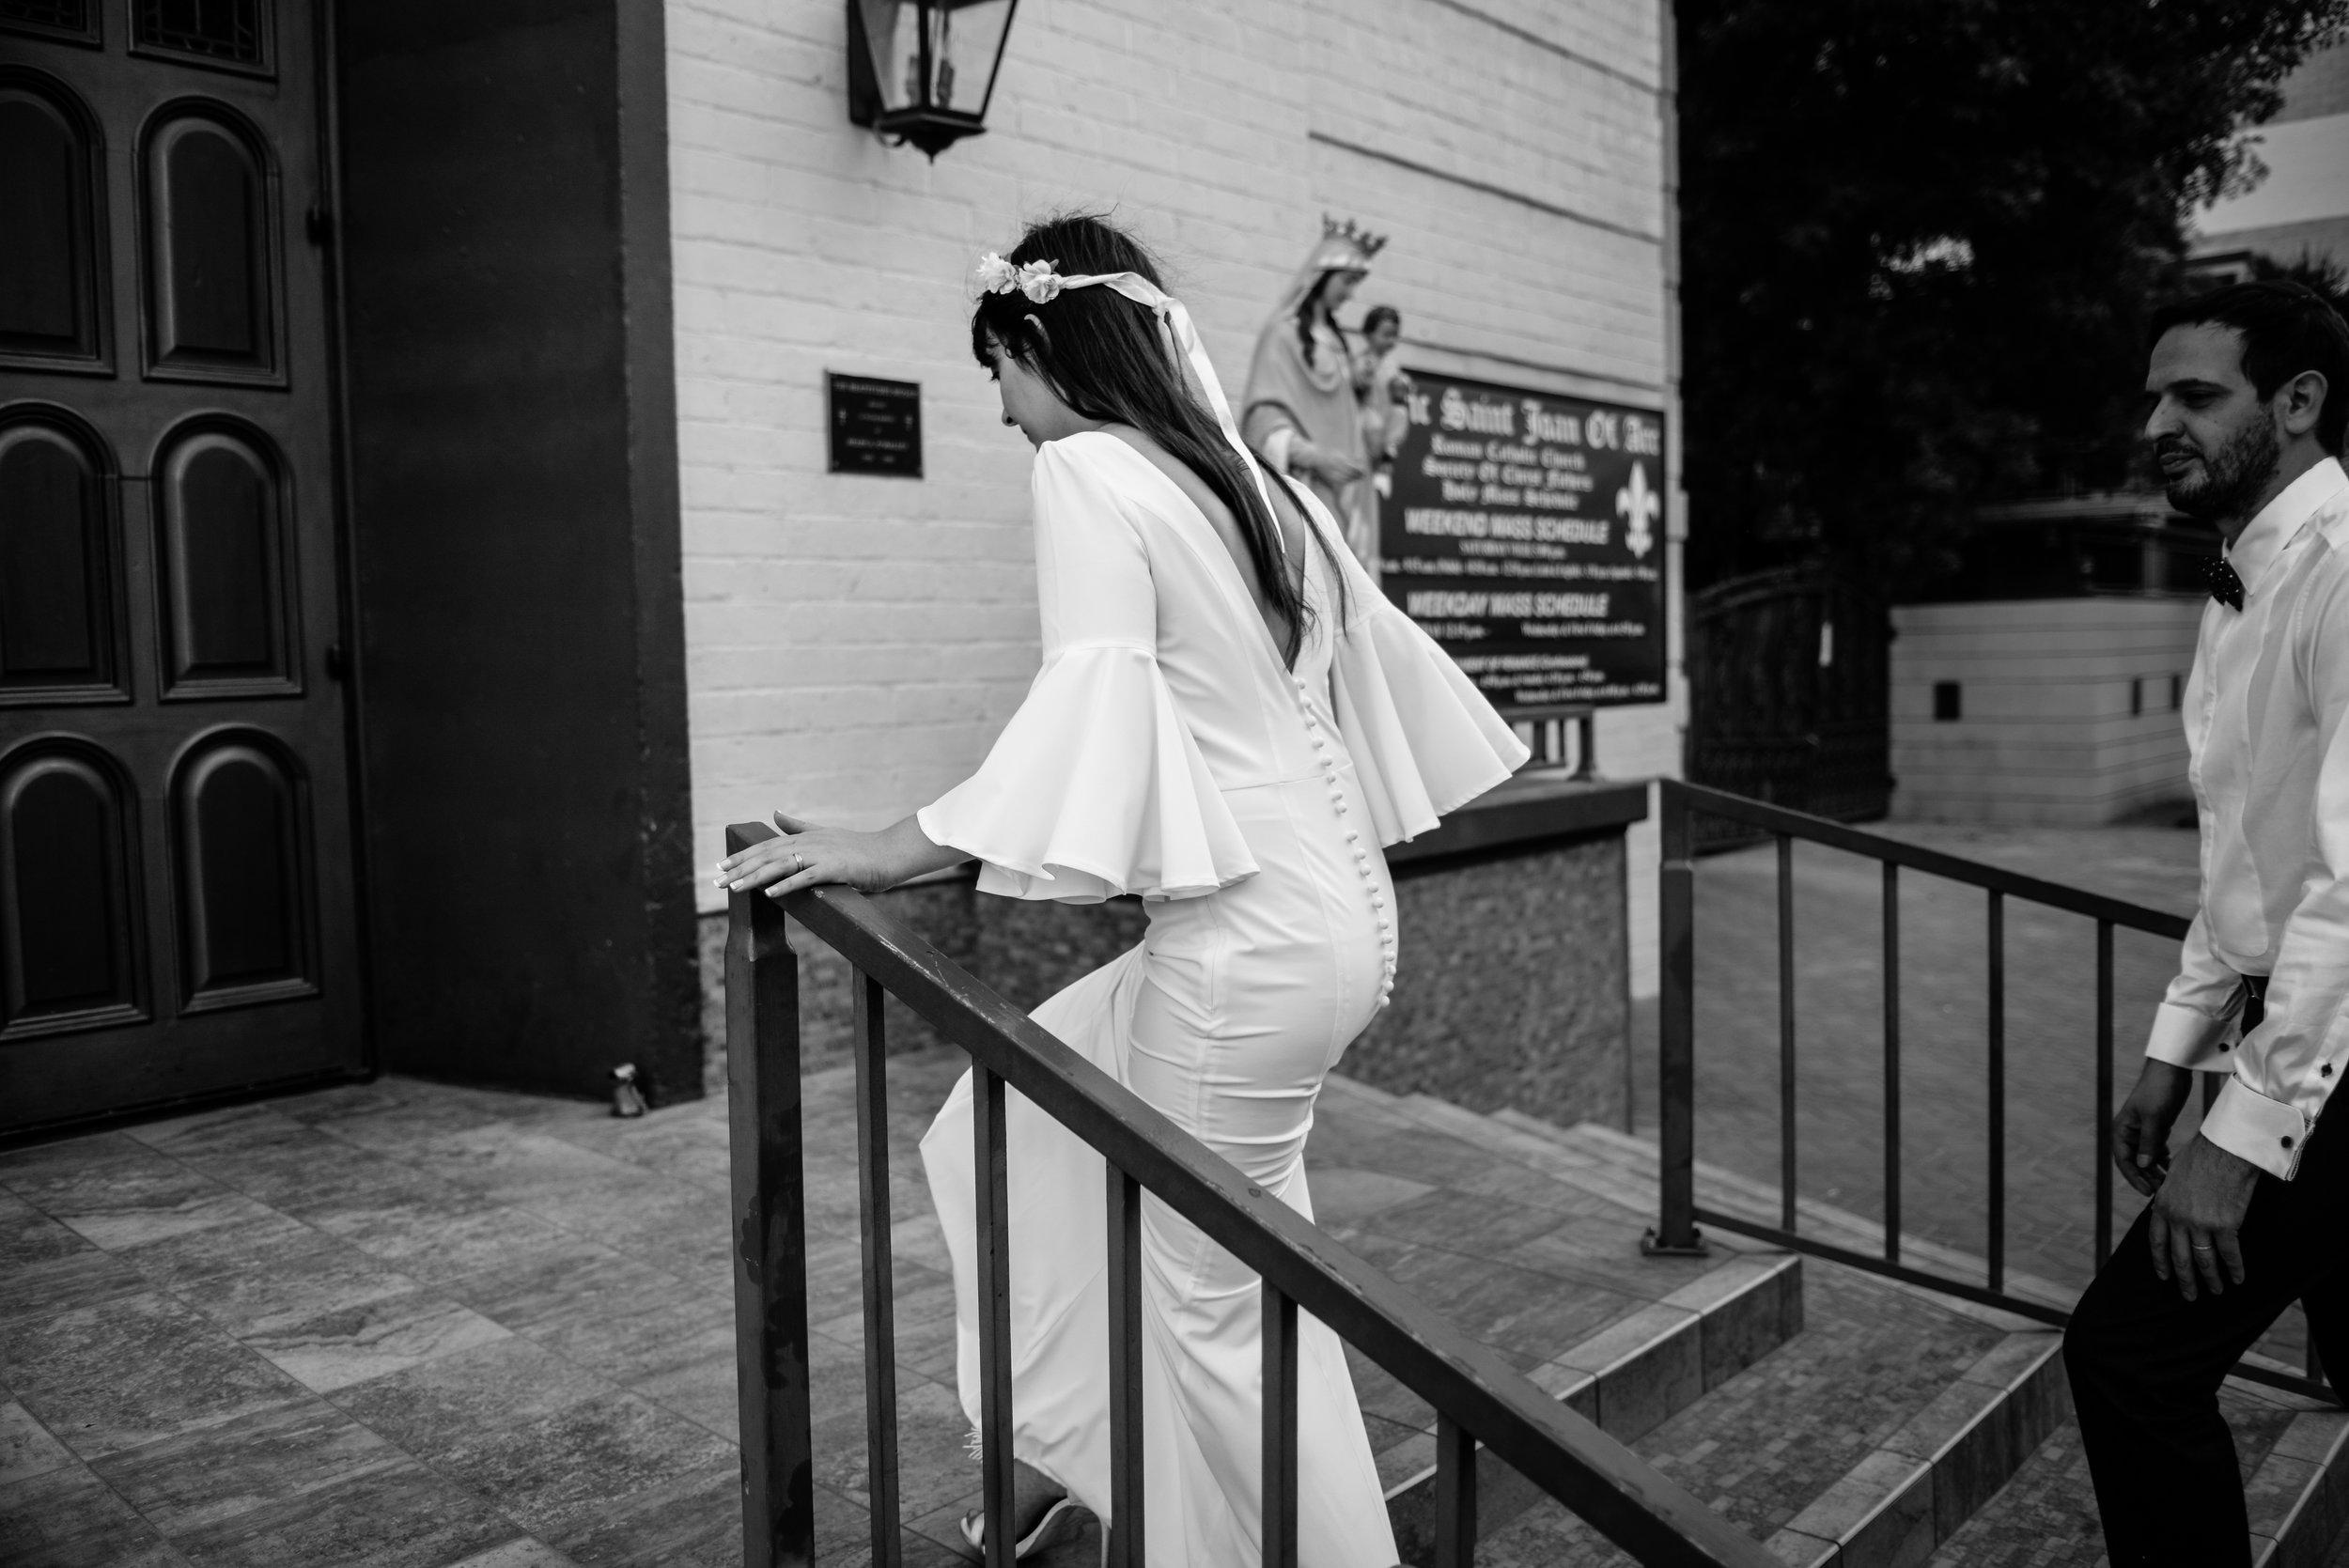 las vegas, las vegas lifestyle, las vegas elopement, elopement, las vegas downtown, dtlv, lifestyle wedding, lifestyle photographer, las vegas photographer, ashley marie myers,